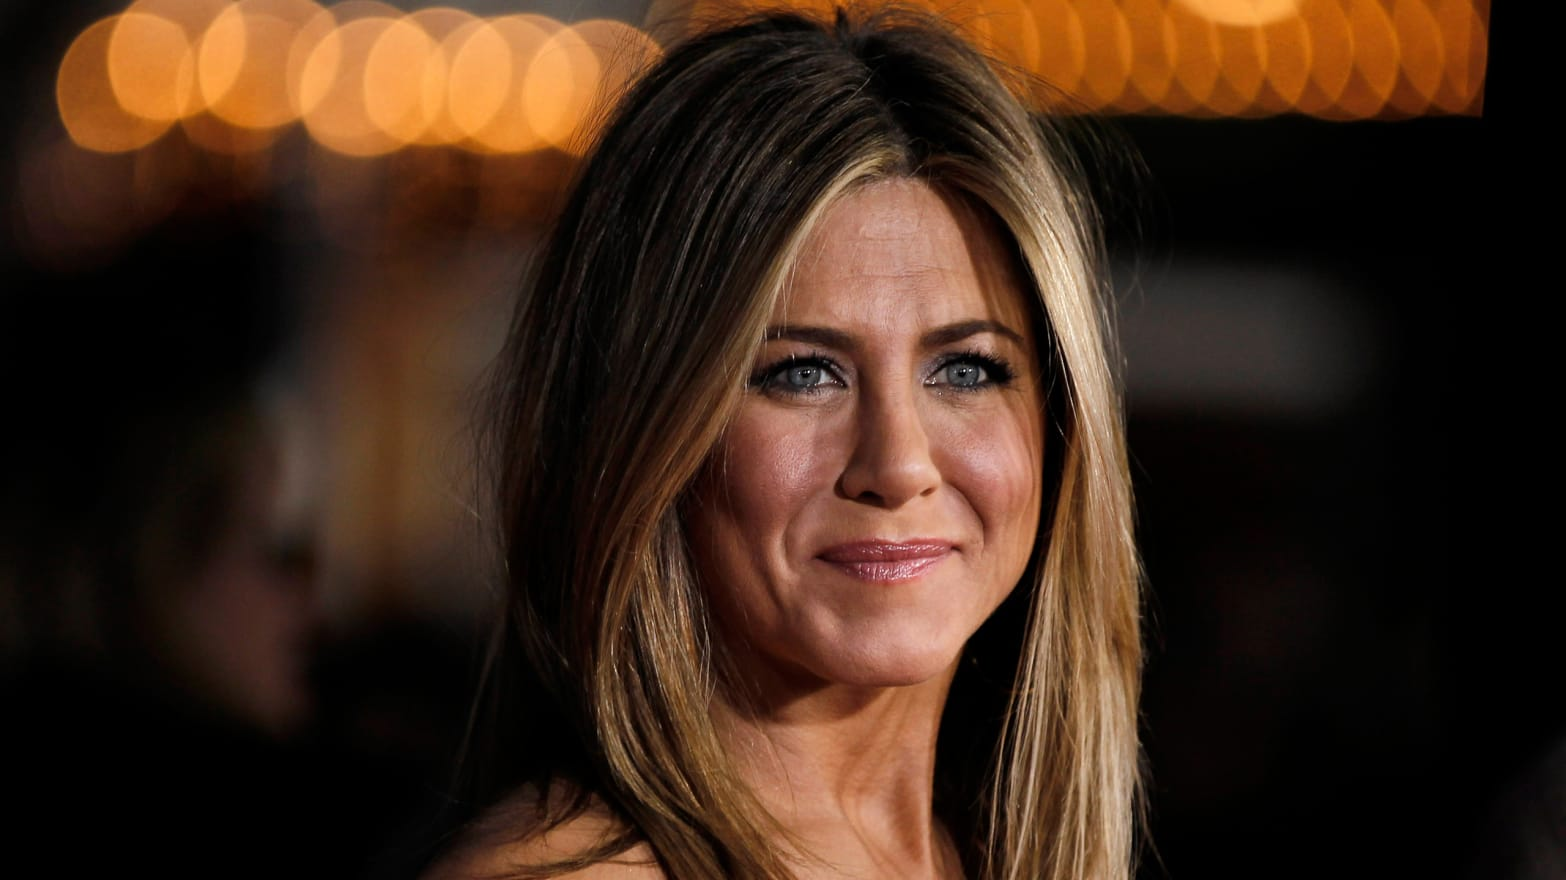 Jennifer Aniston's New Movie Sucks  What's She Doing Wrong?